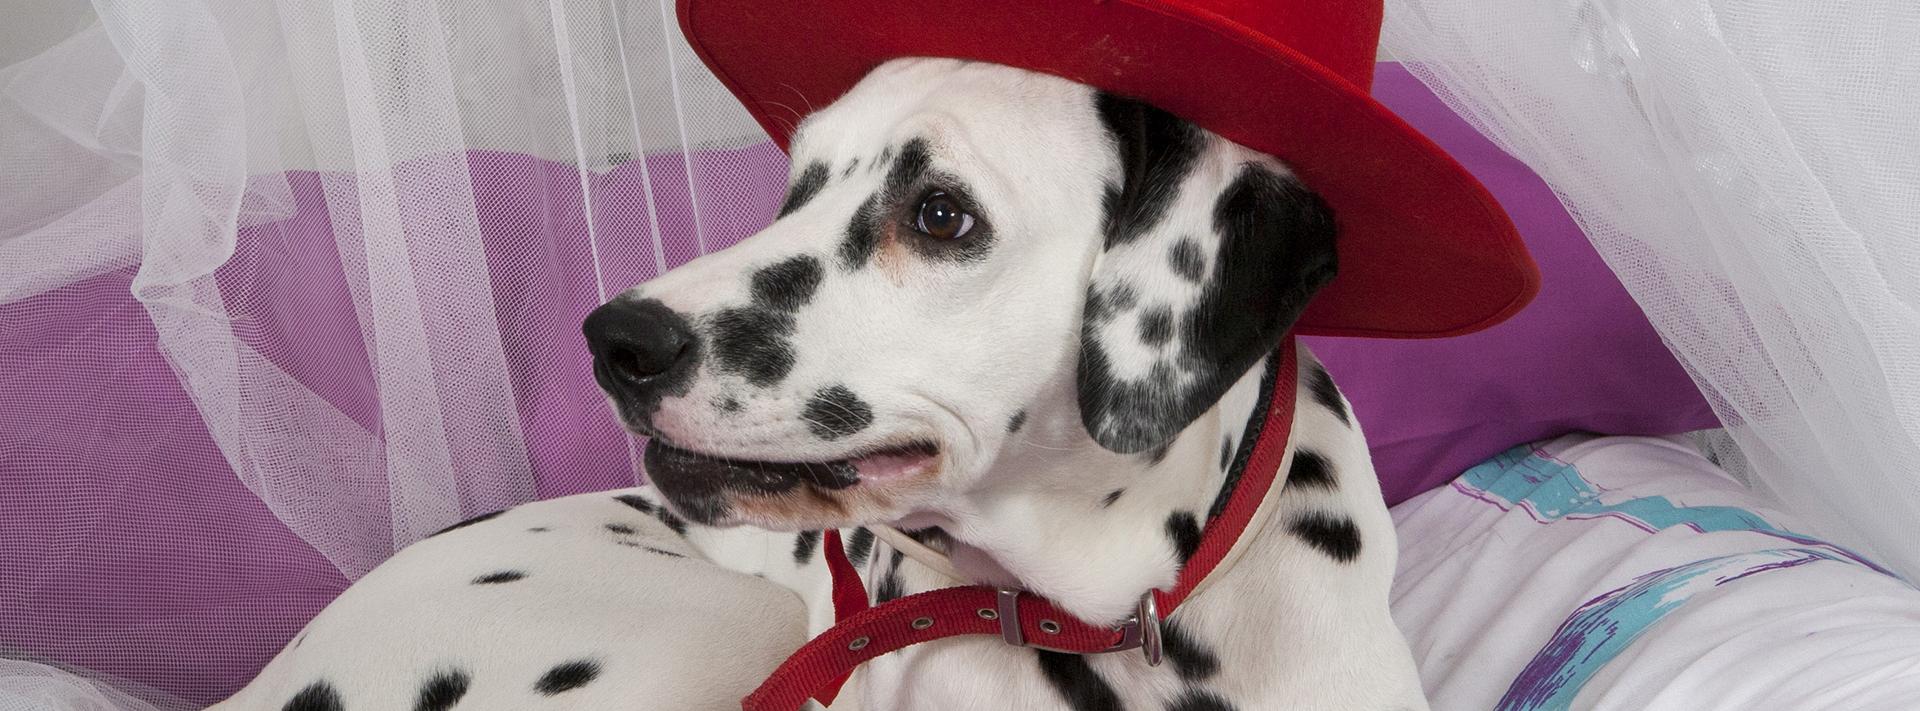 fotos-de-mascotas-fuenlabrada-bjfotografia